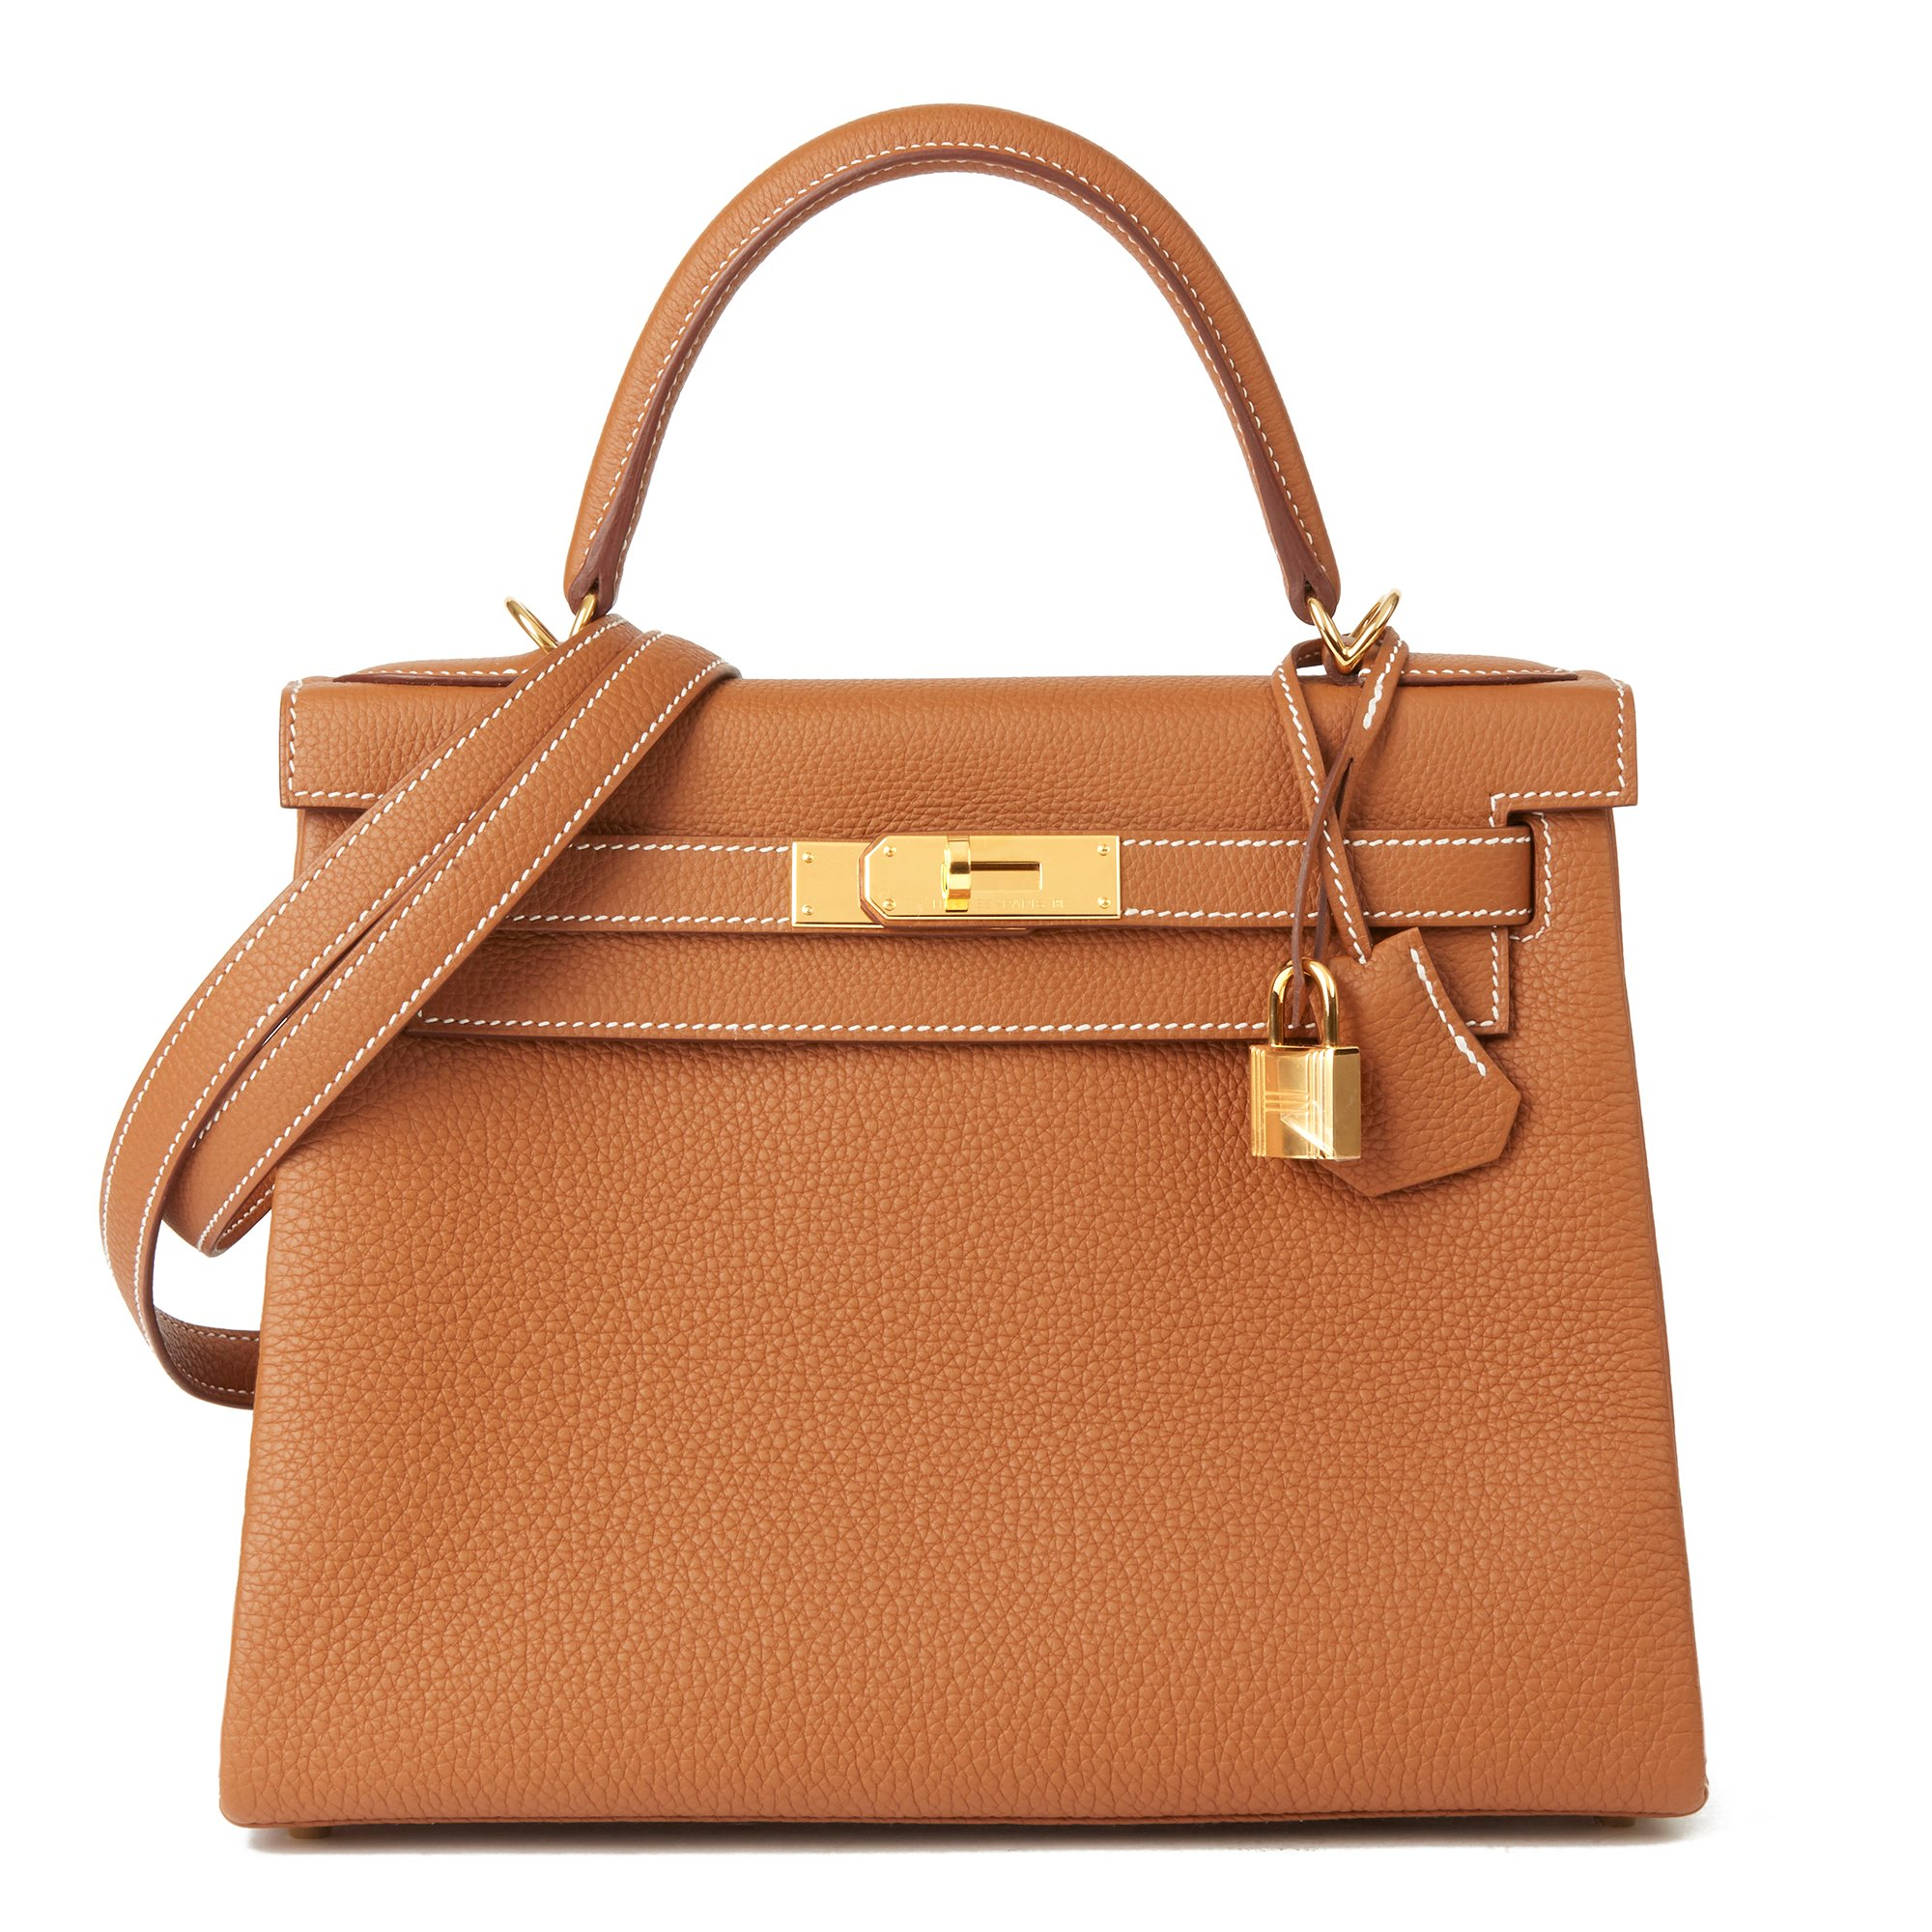 Hermès Gold Togo Leather Kelly 28cm Retourne